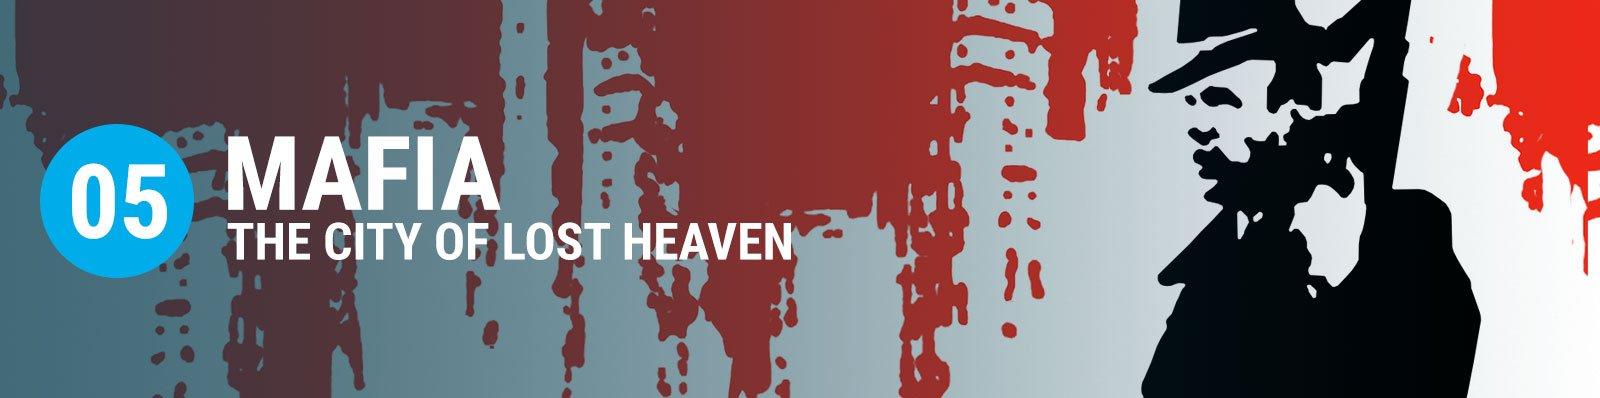 Mafia: The Сity of Lost Heaven